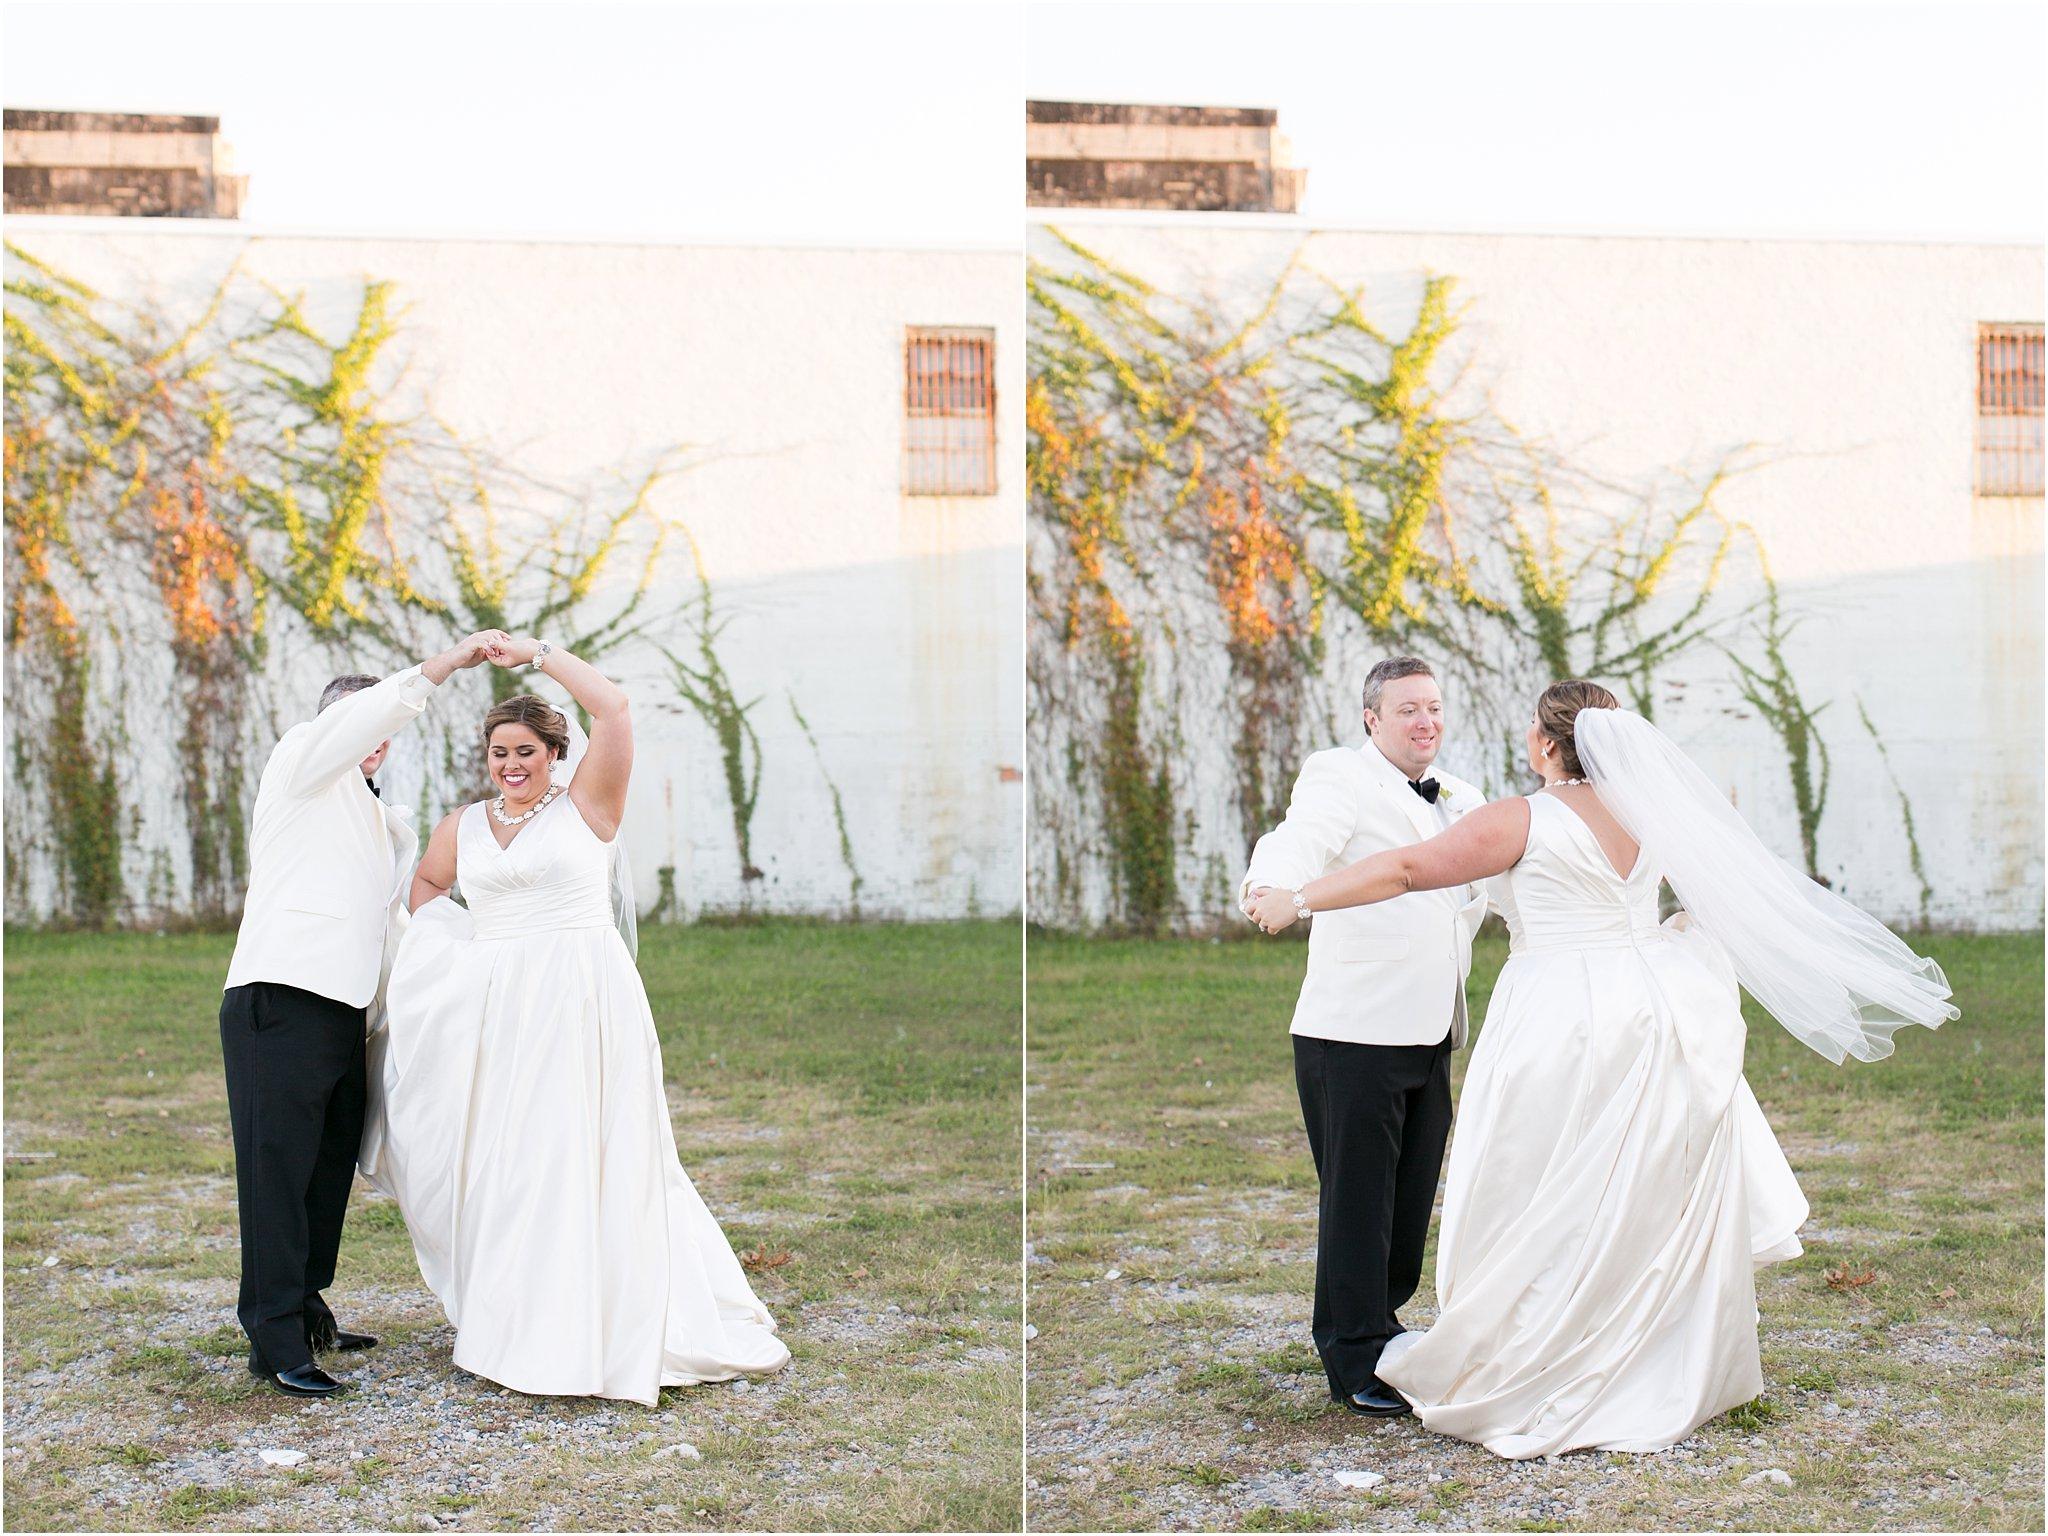 va_jessica_ryan_photography_virginia_wedding_norfolk_harrison_opera_house_norfolk_arts_district_portraits_3831